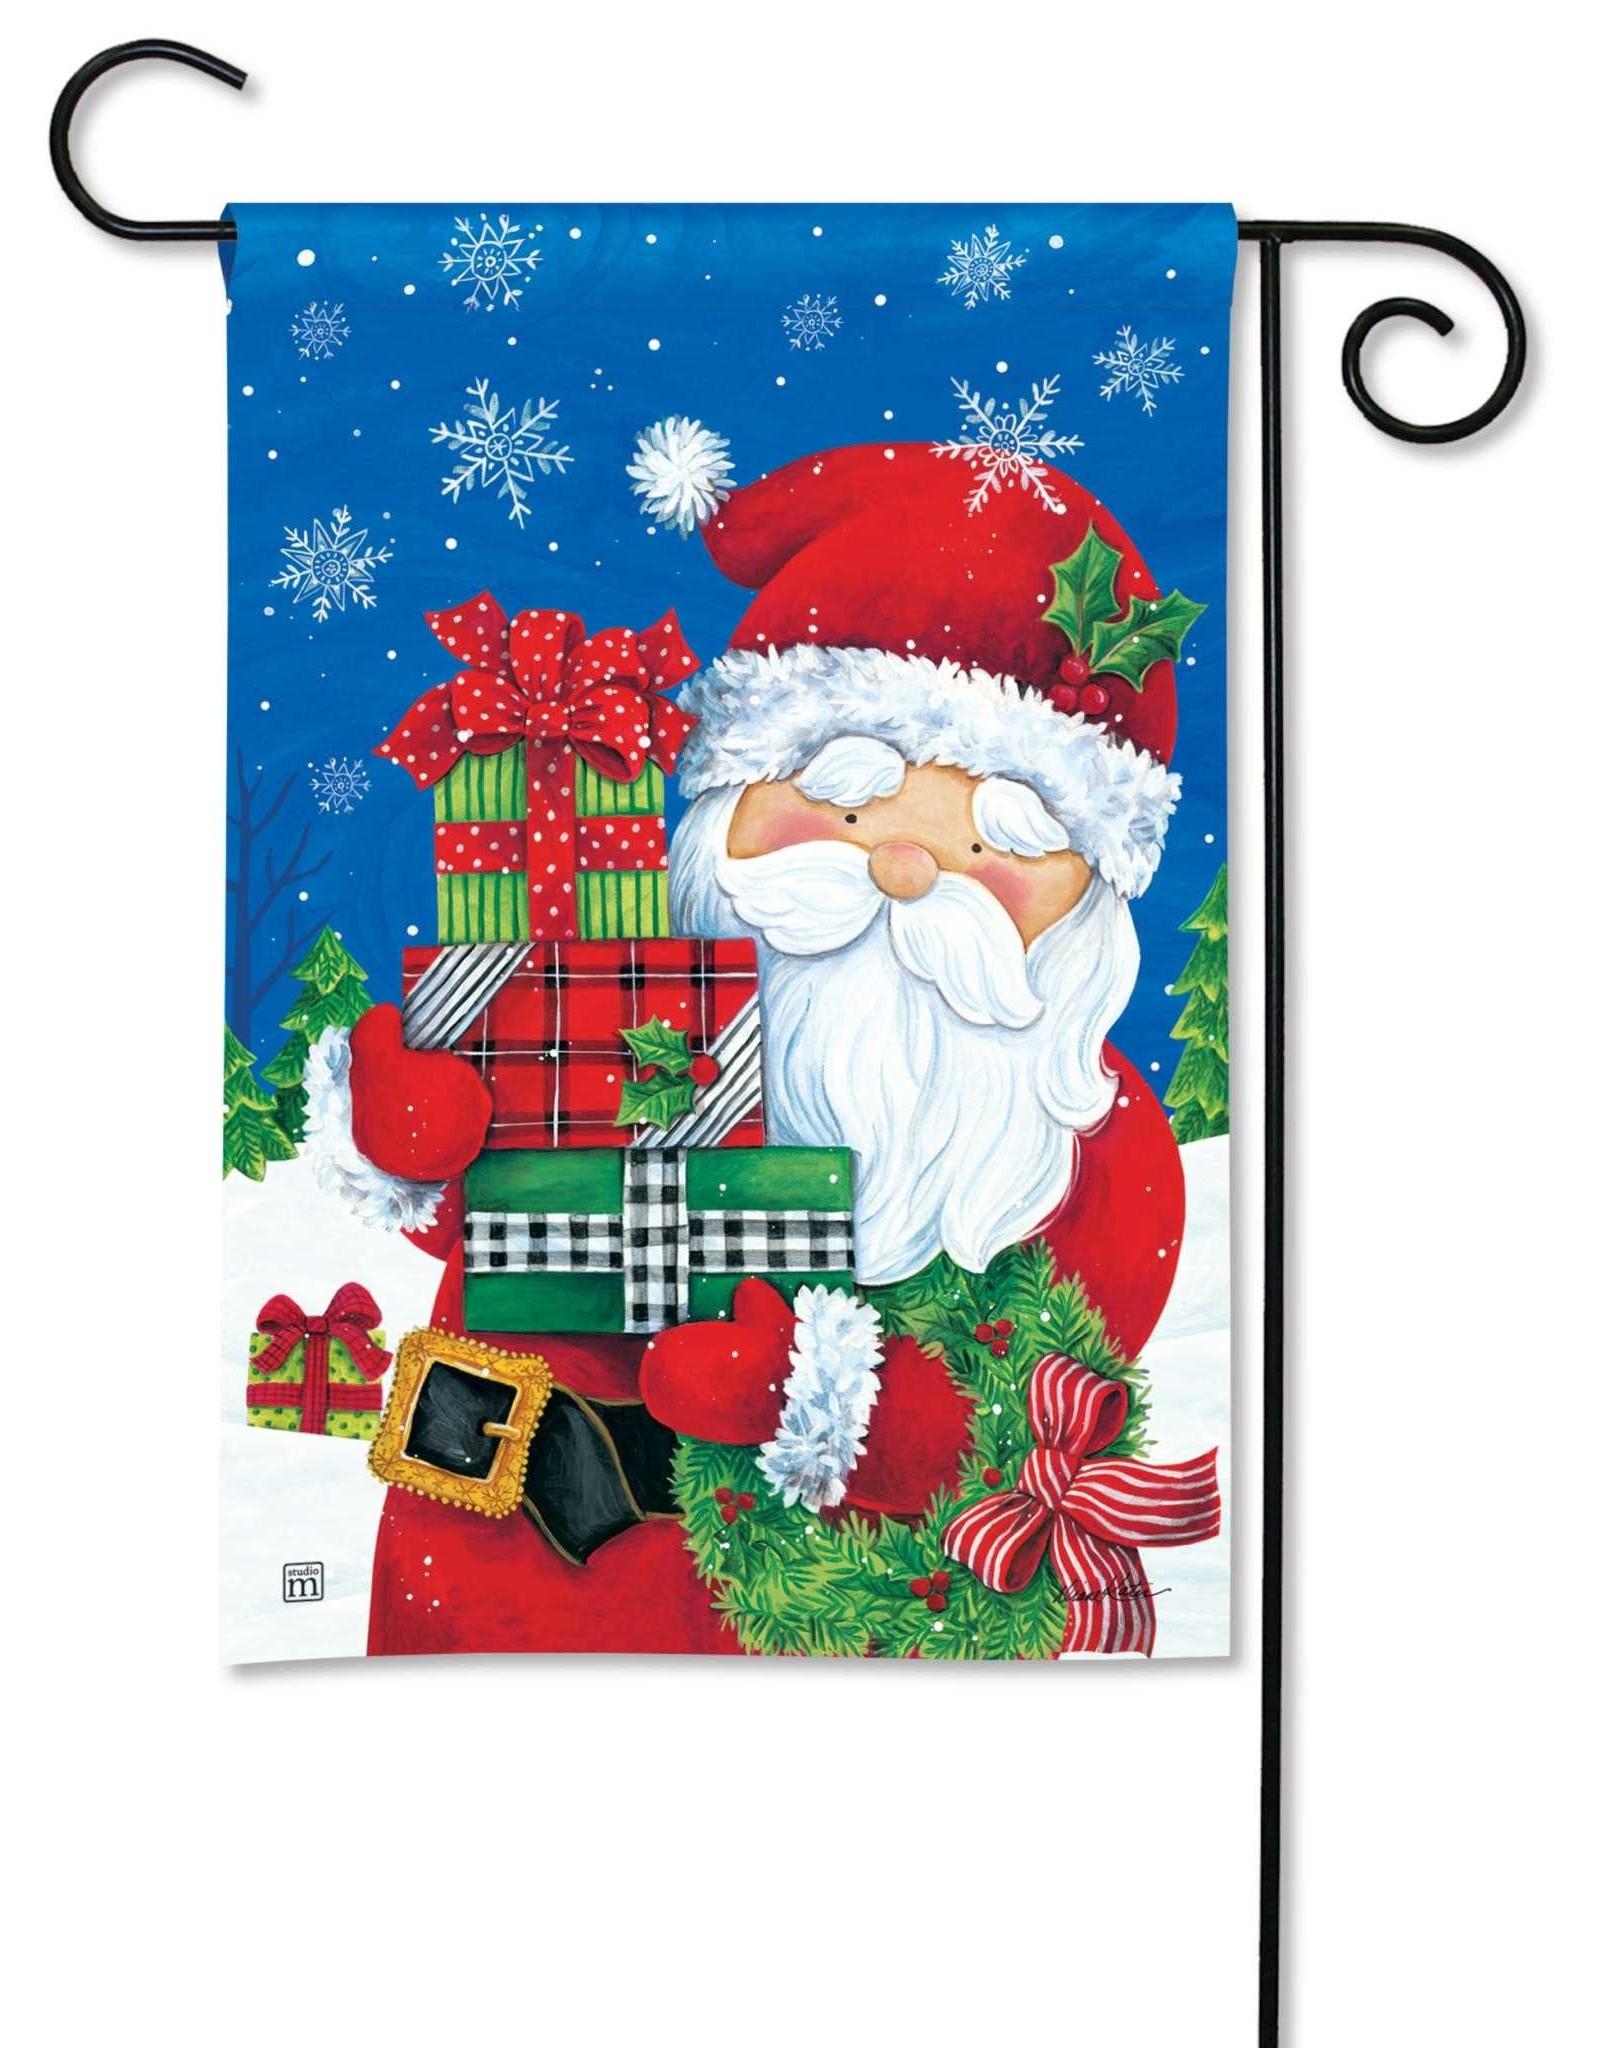 Studio M GF Gifts from Santa